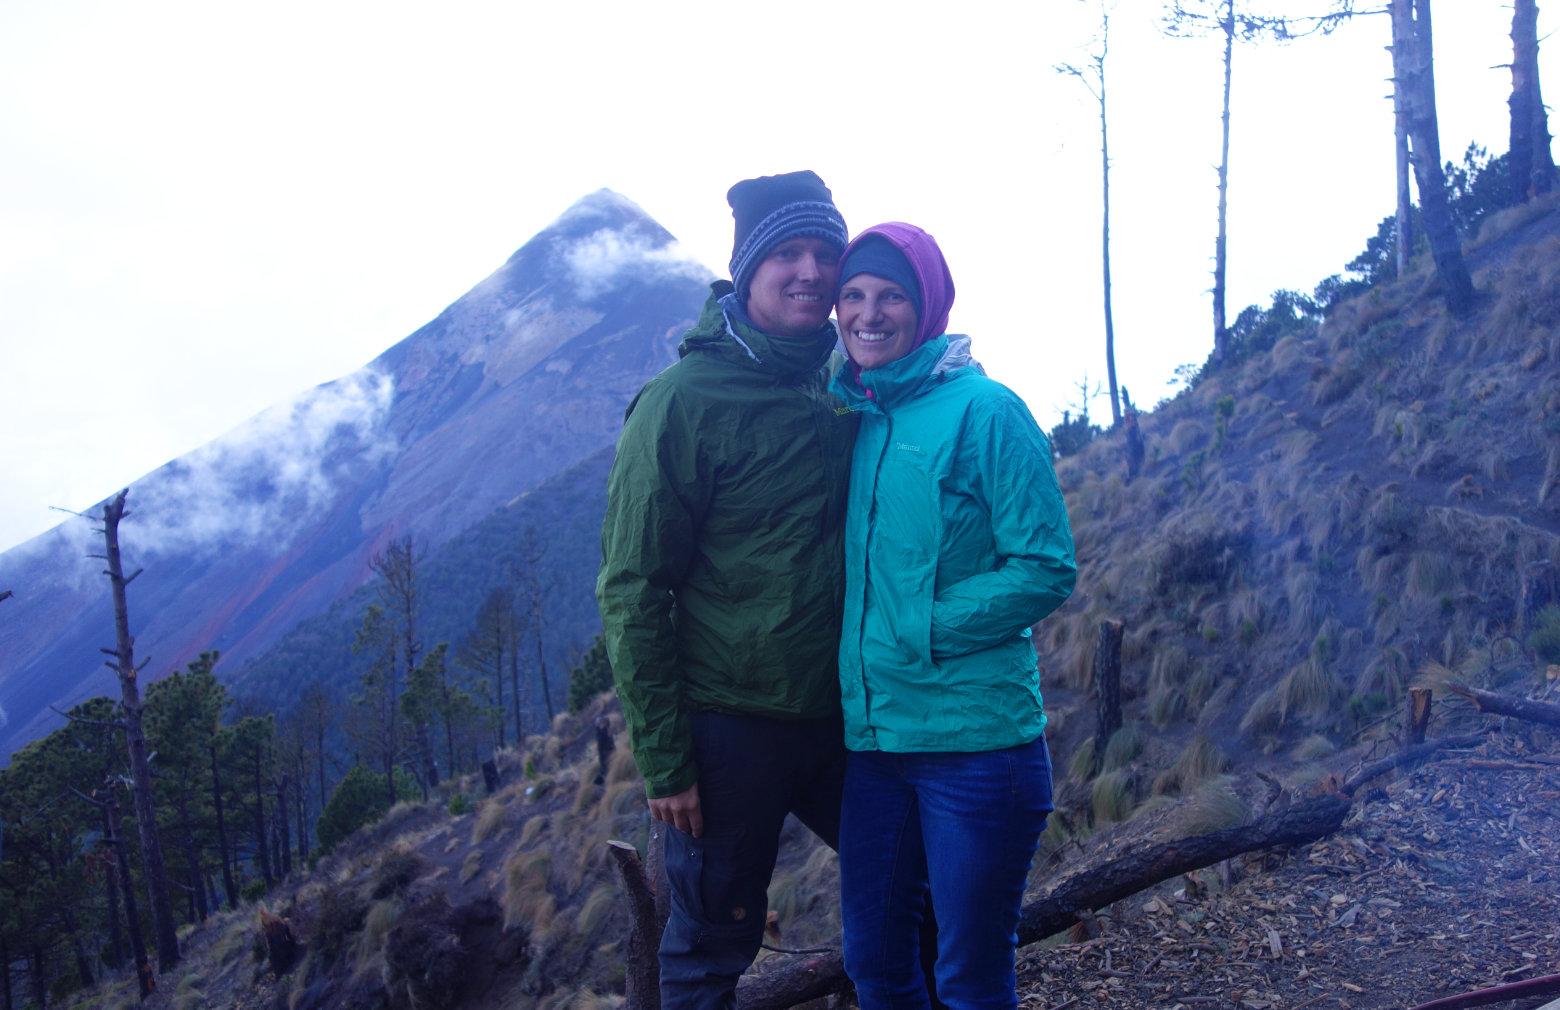 Antigua Vulkan Wanderung Paar